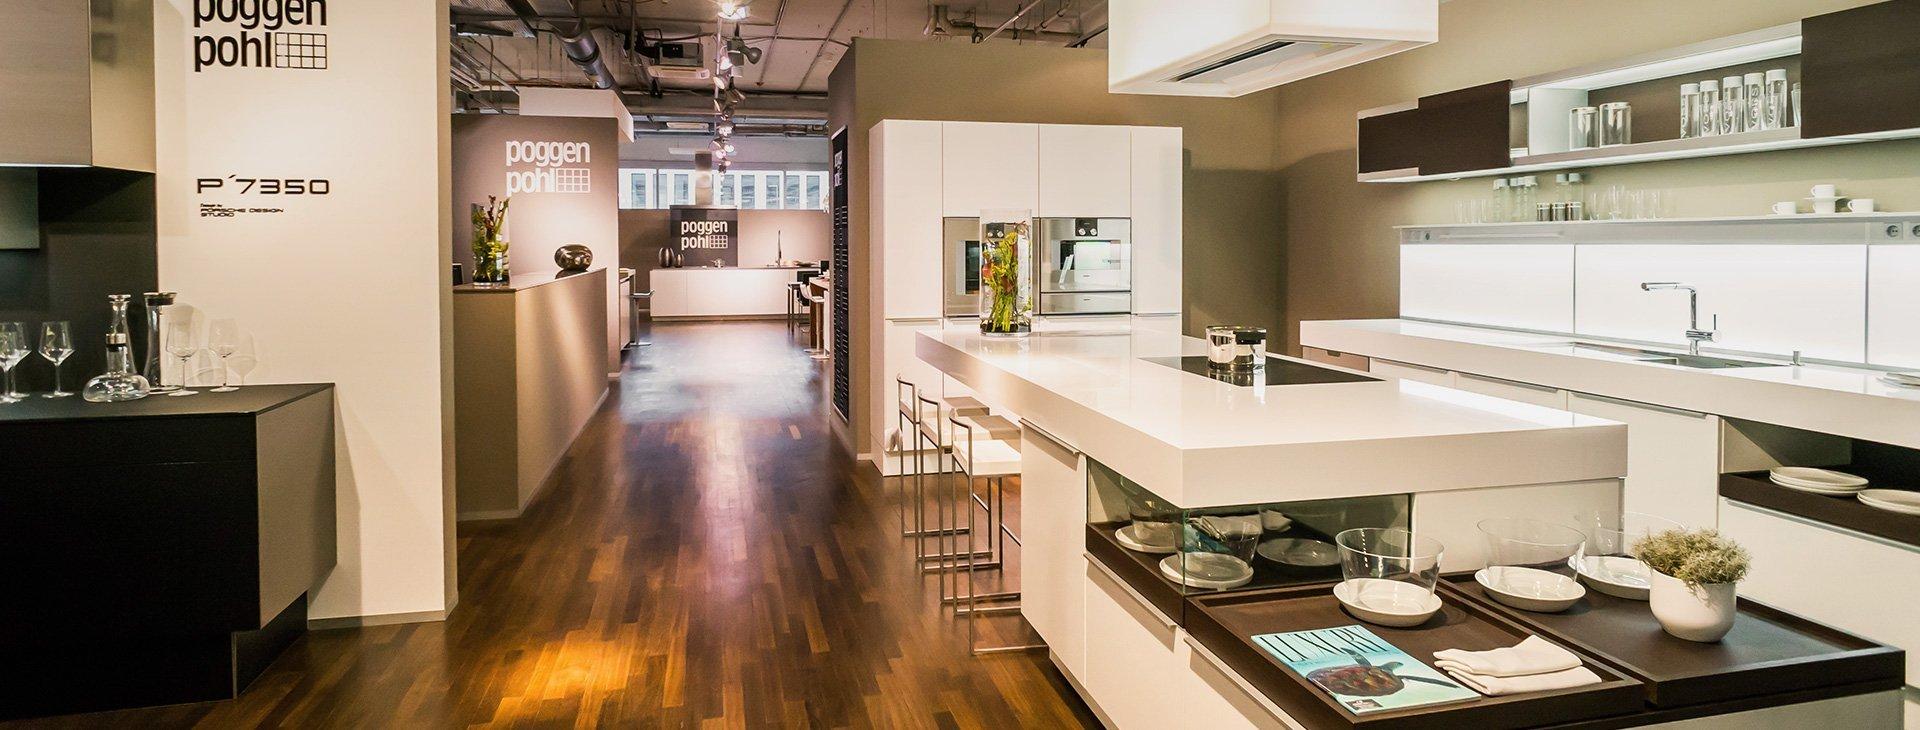 Küche Poggenpohl | Poggenpohl Ihre Stores Im Stilwerk Dusseldorf